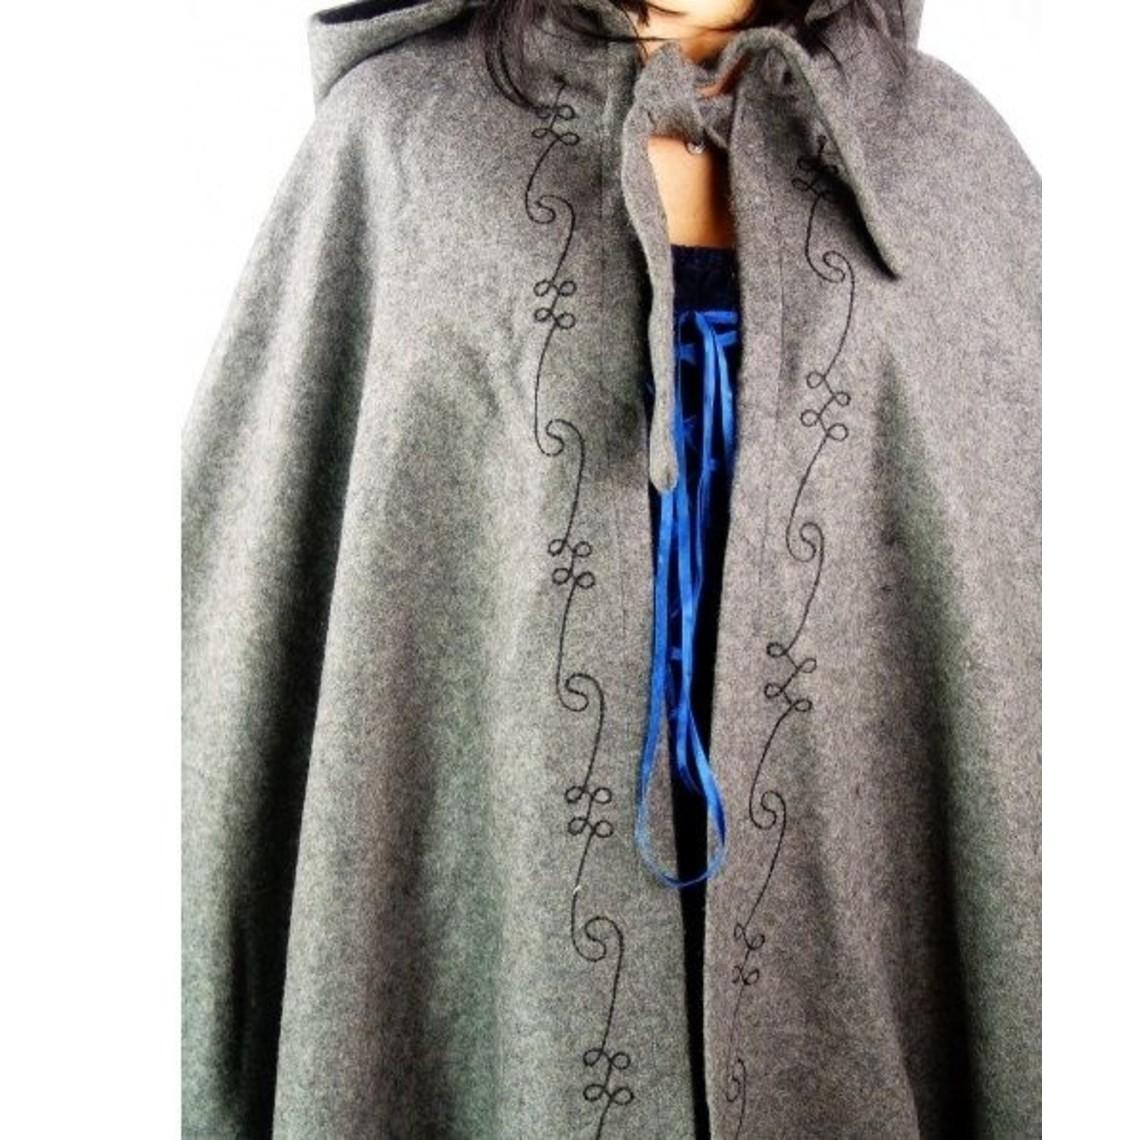 Leonardo Carbone Geborduurde mantel Damia, blauw